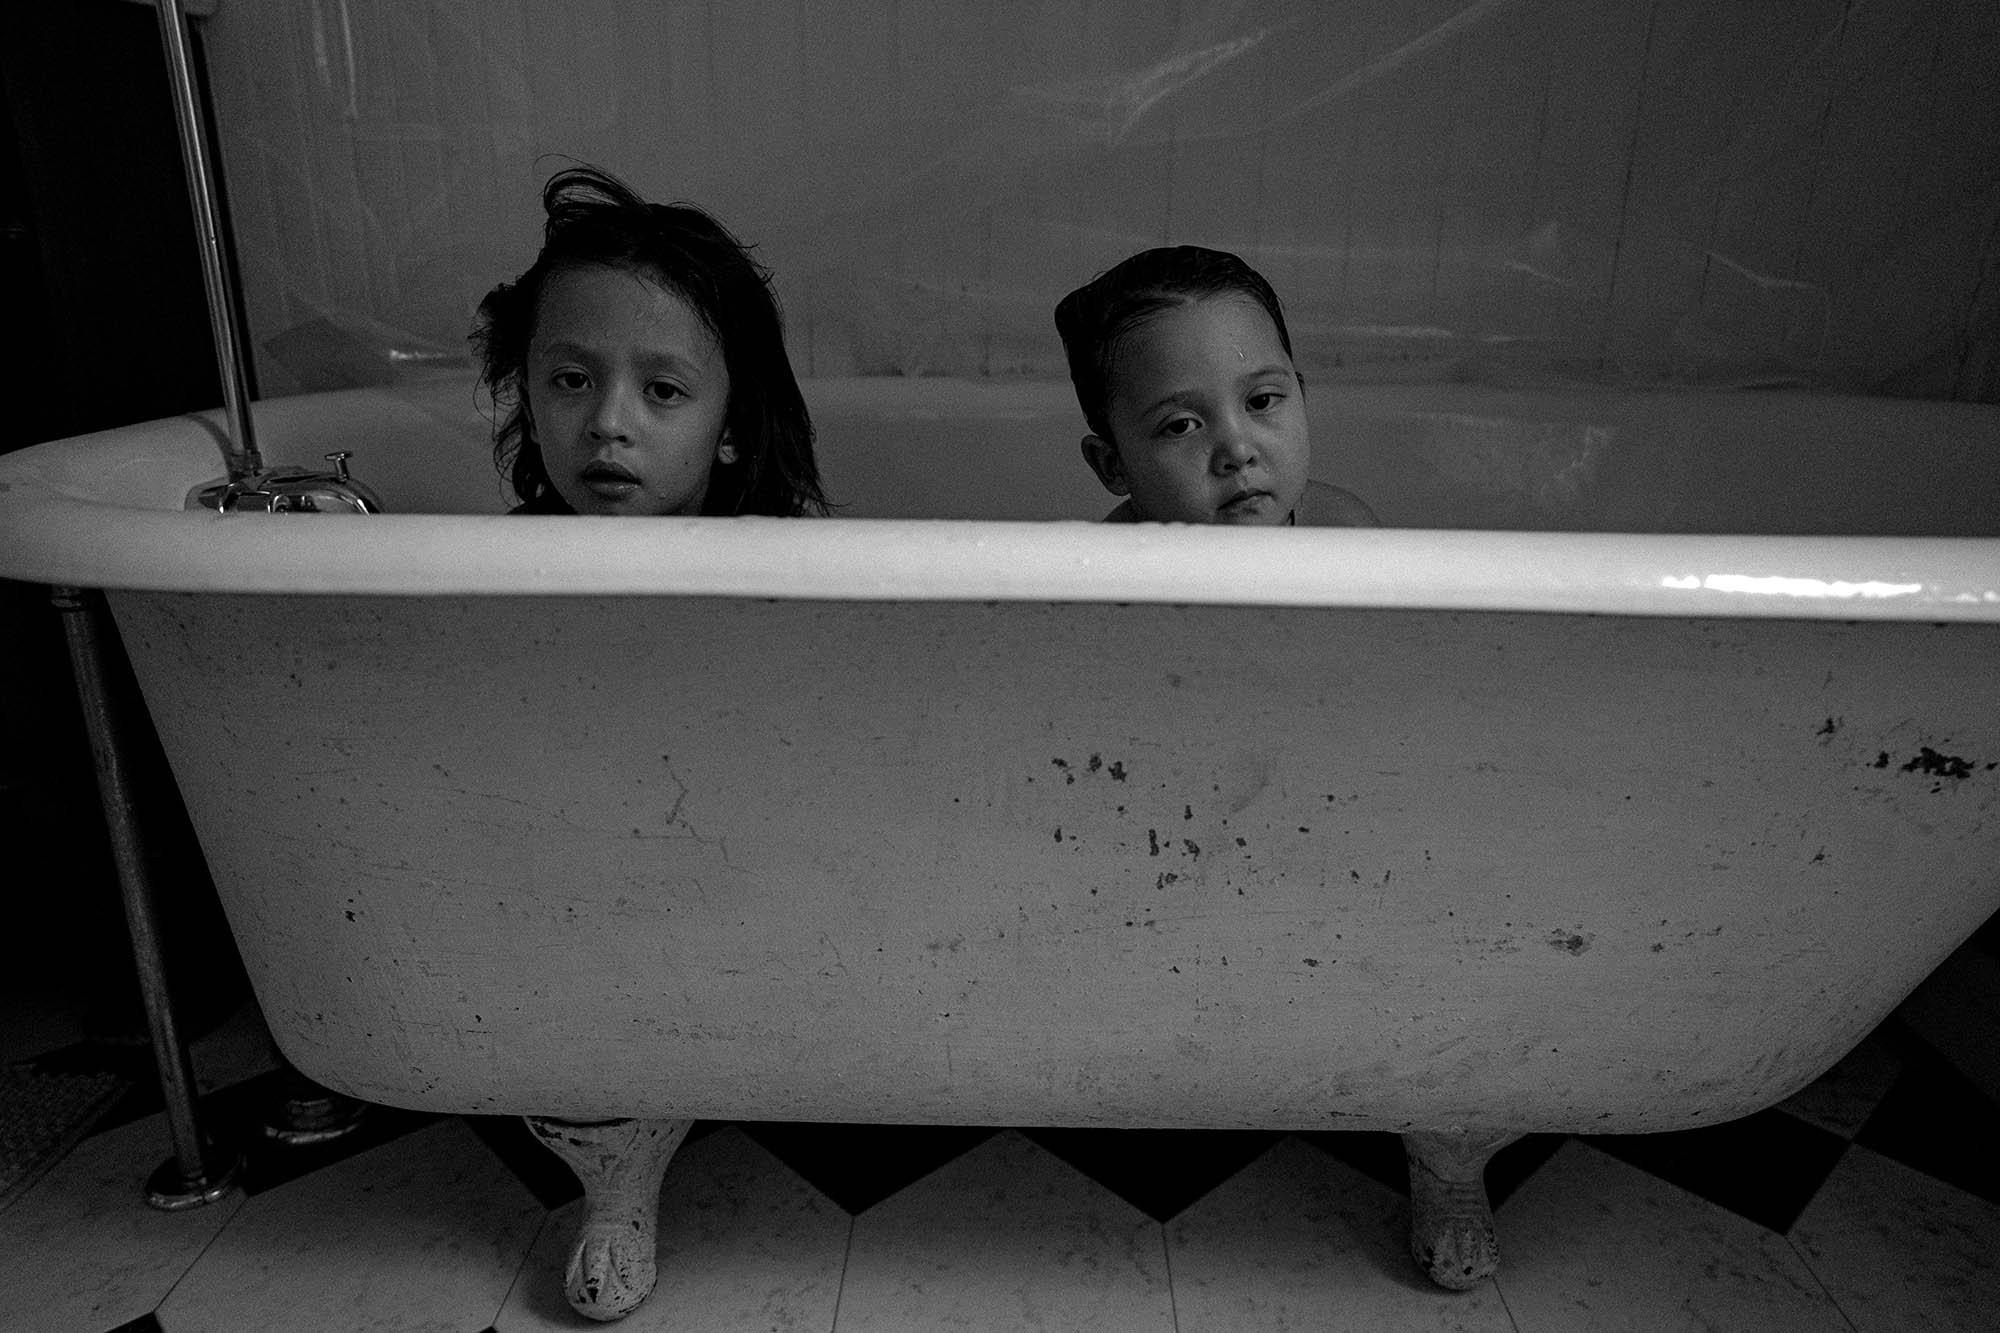 bathtub portrait